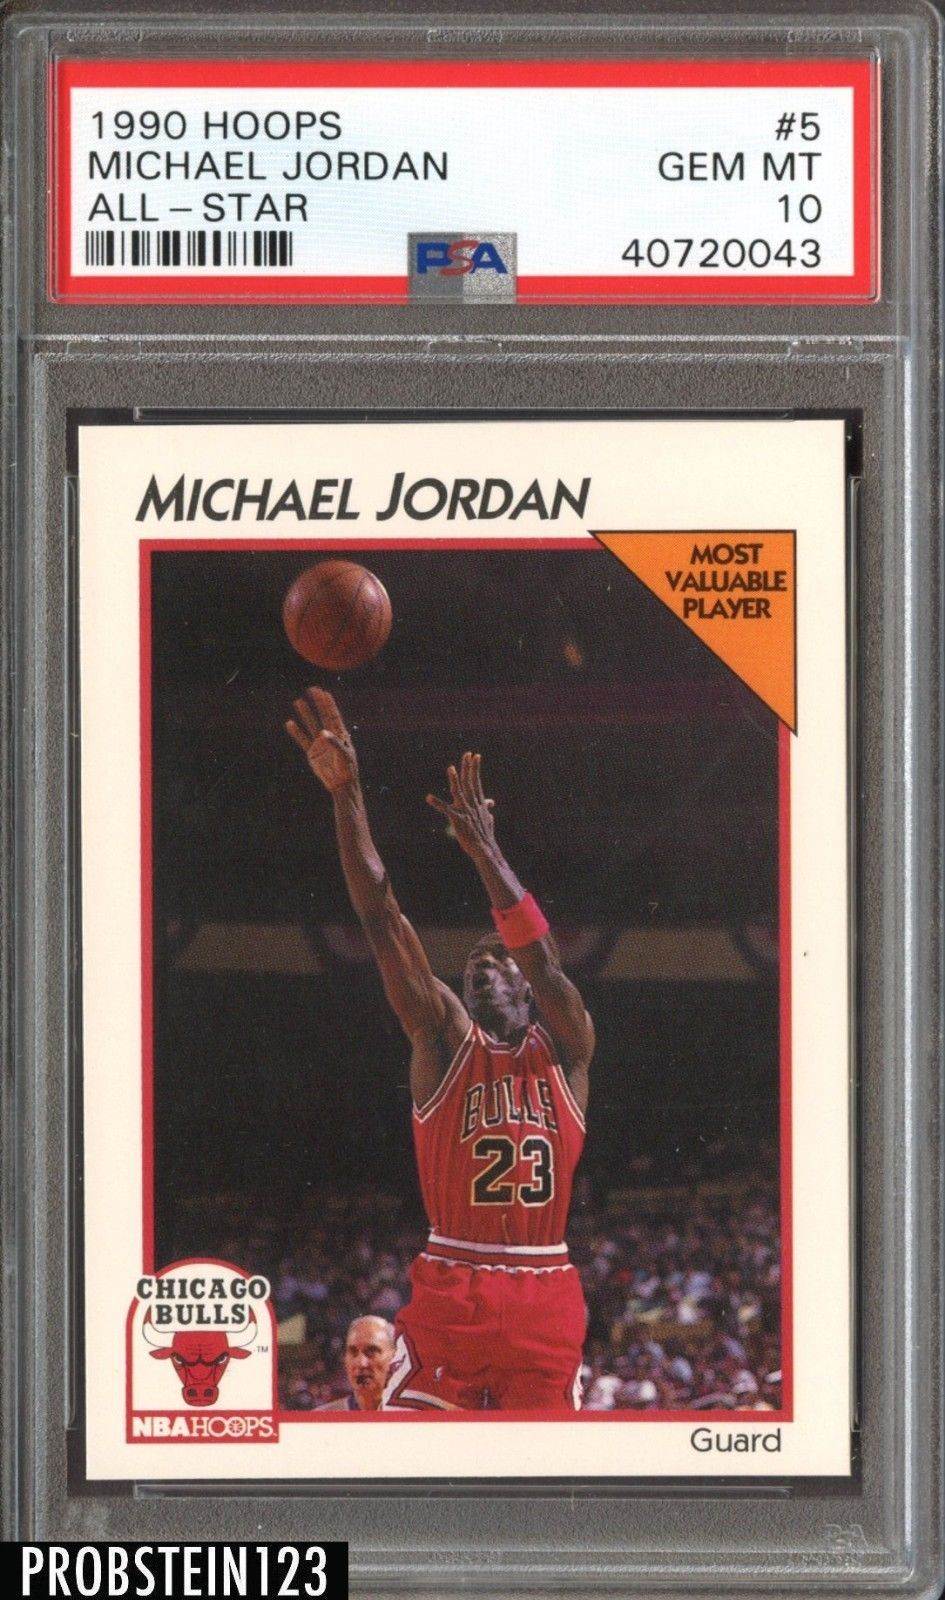 bb3b5a17b69 1990 Hoops  5 All-Star Michael Jordan PSA 10 GEM MT  MichaelJordan ...